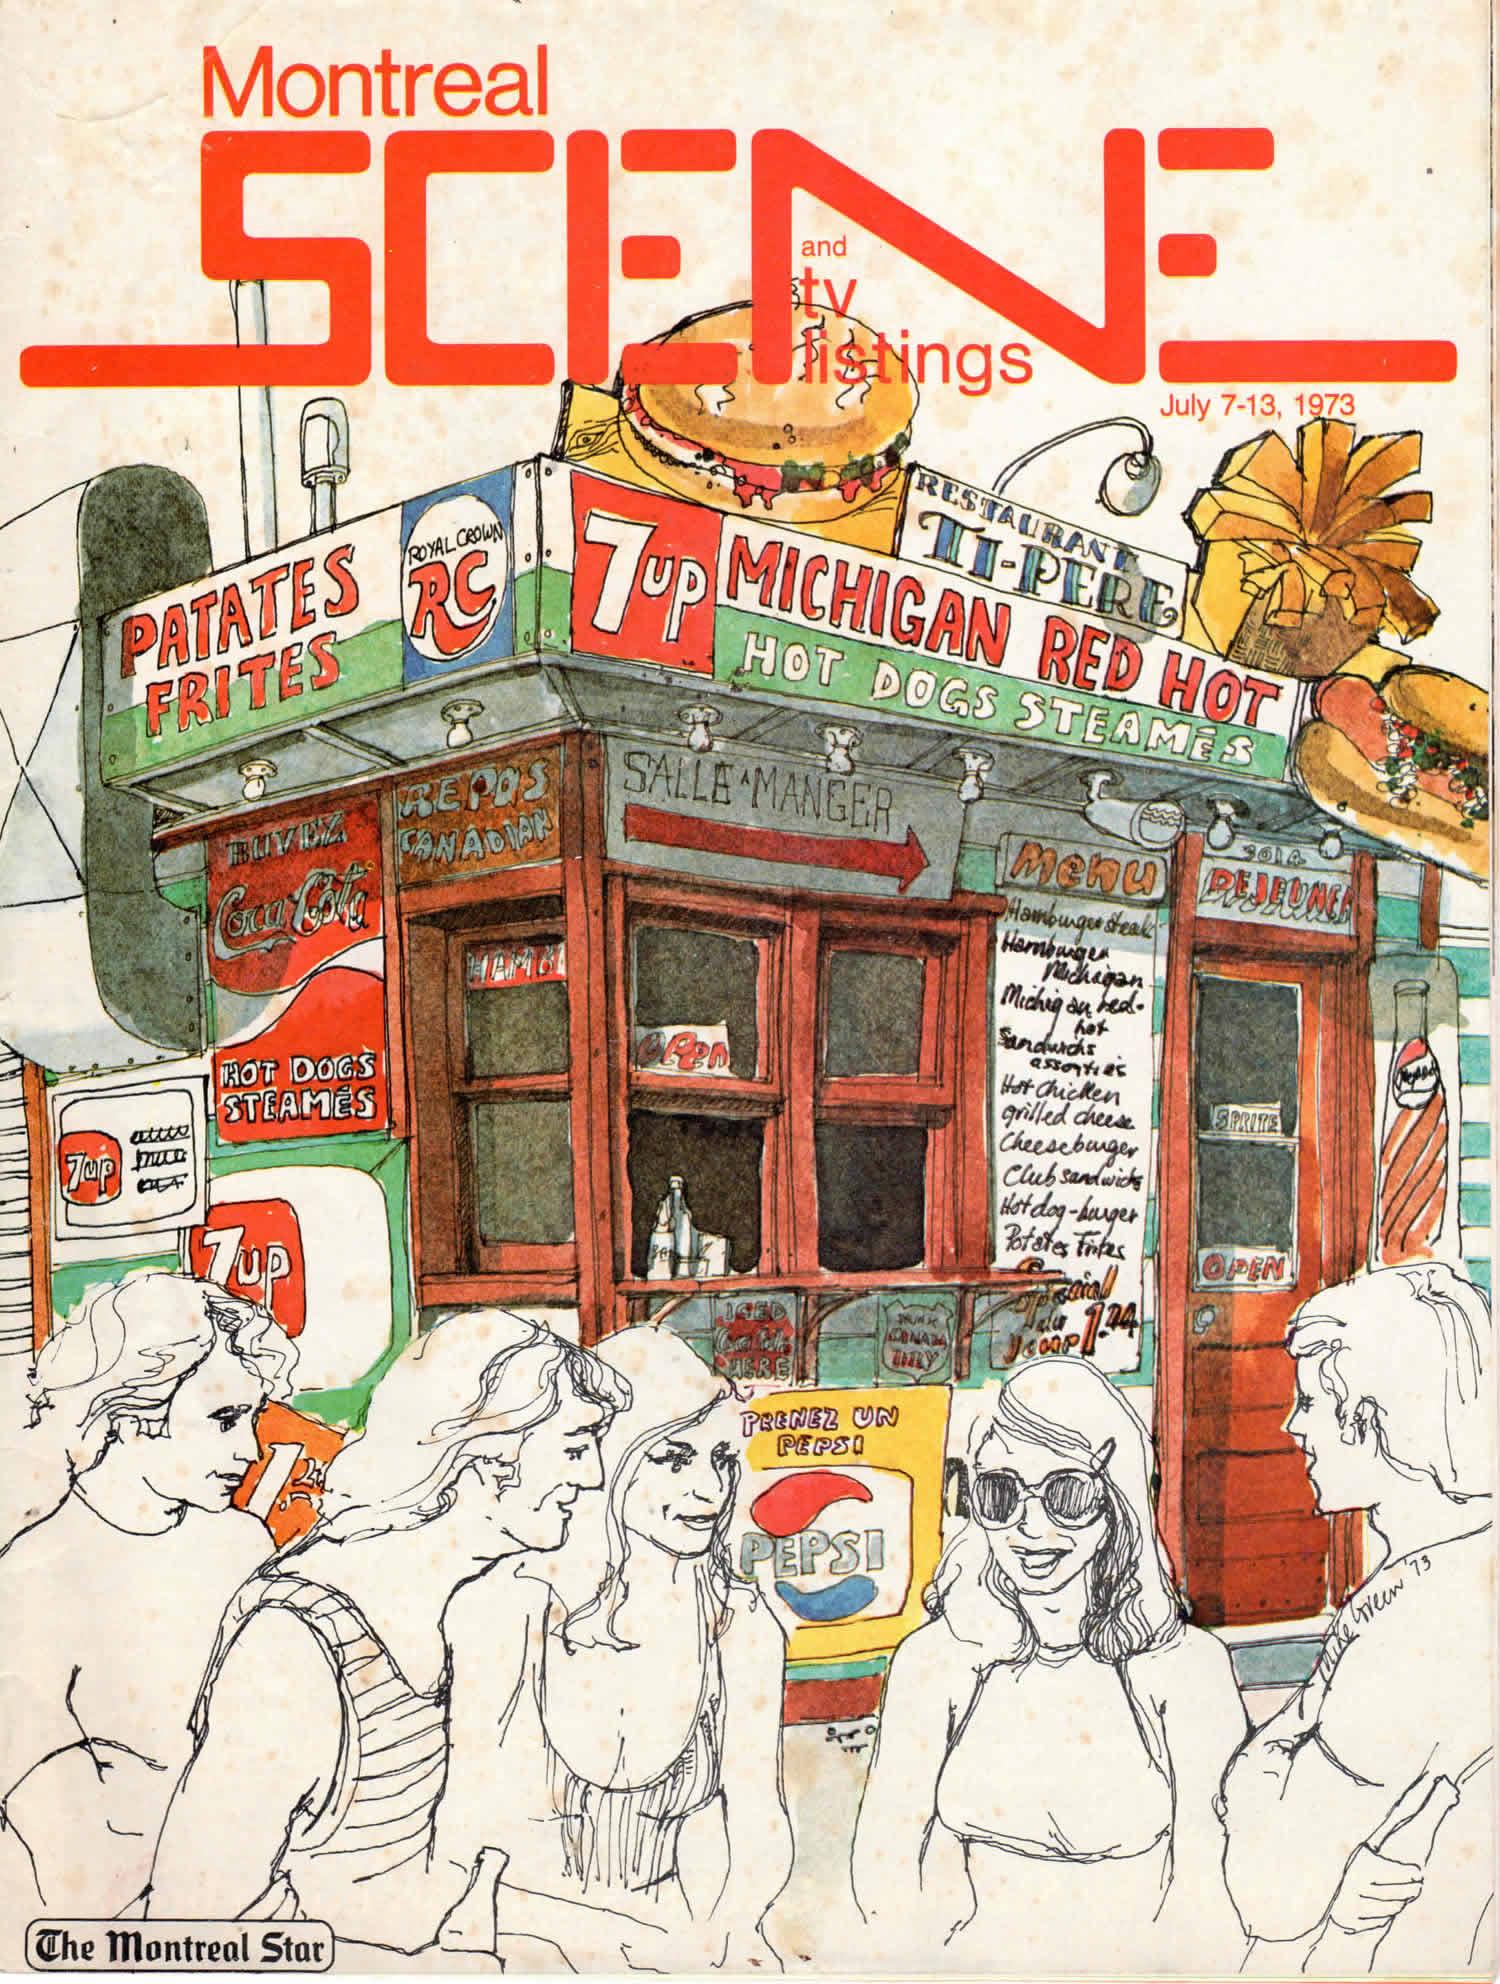 1965-1973, illustration